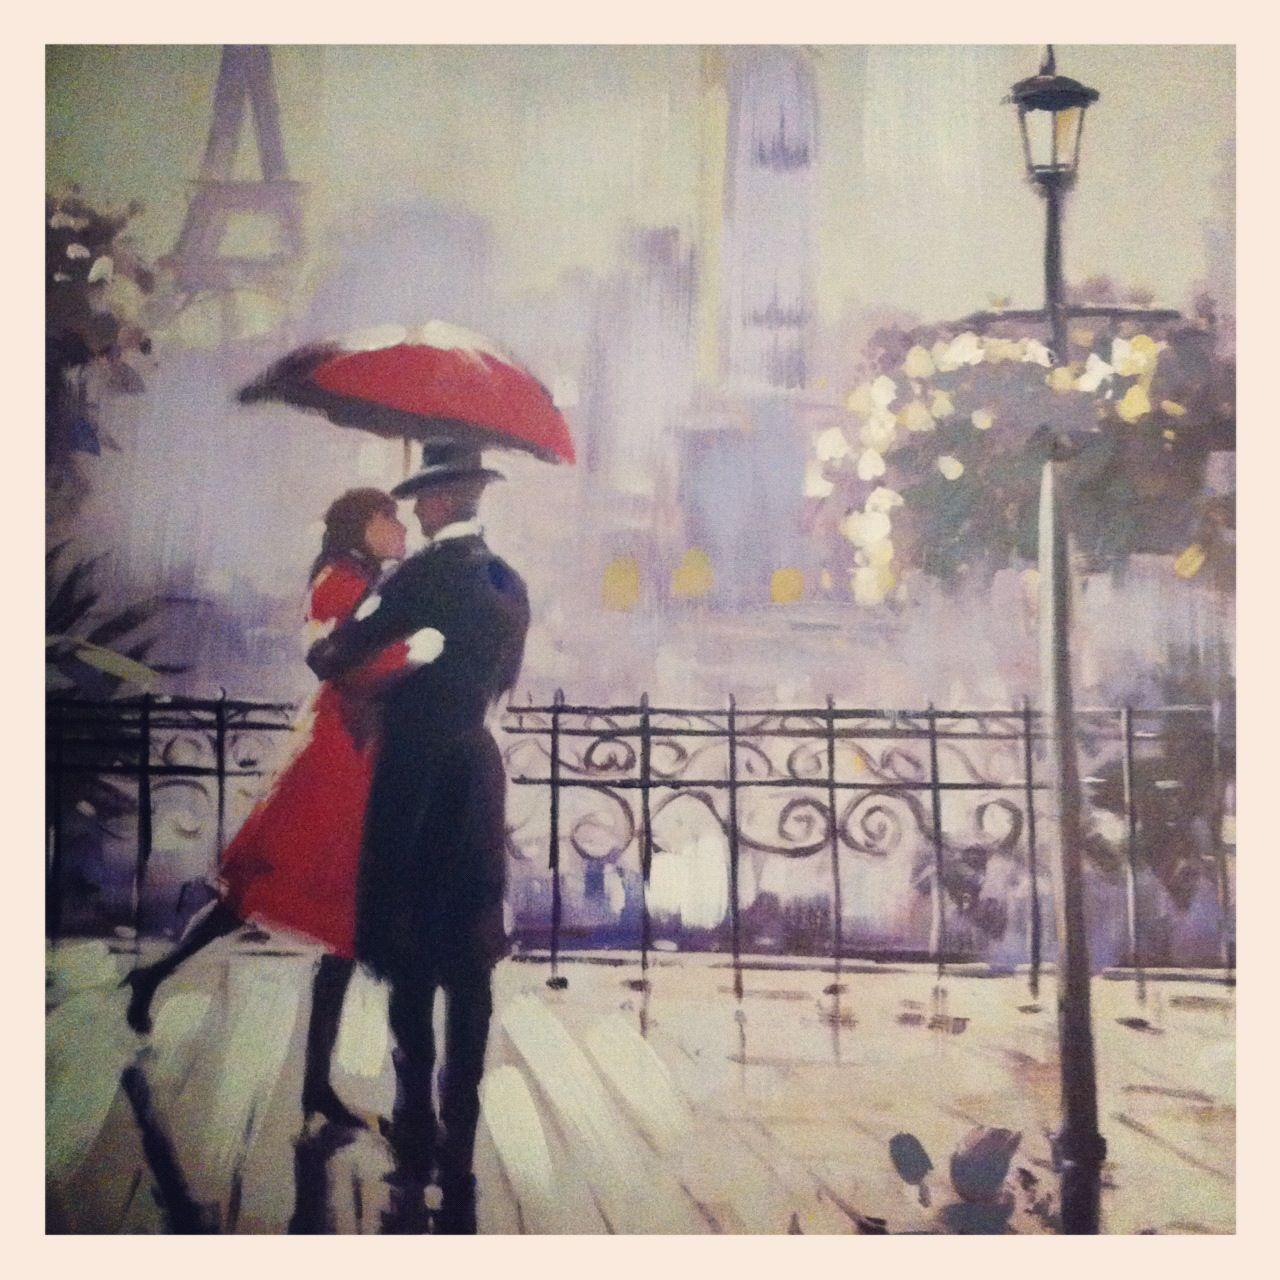 Gorgeous pic. Paris in the rain